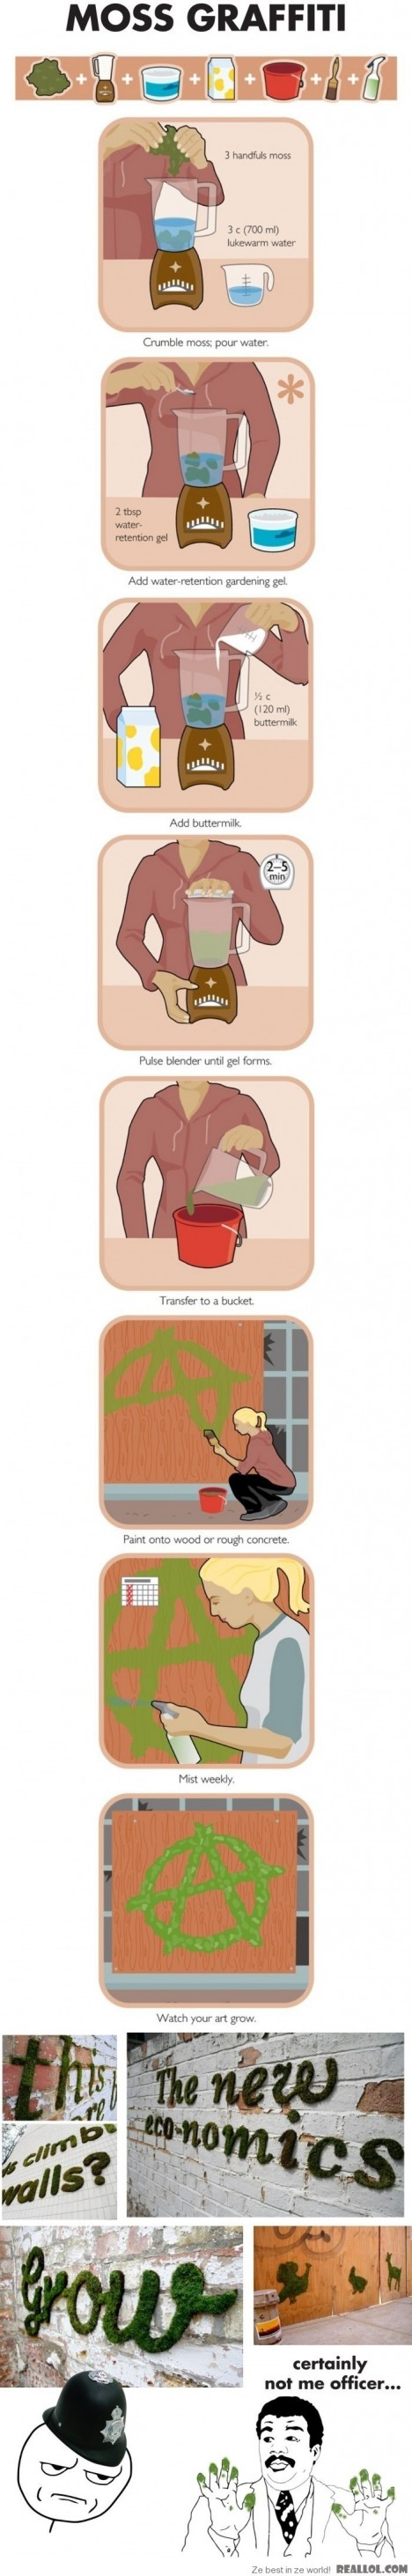 Moosfiti Anleitung